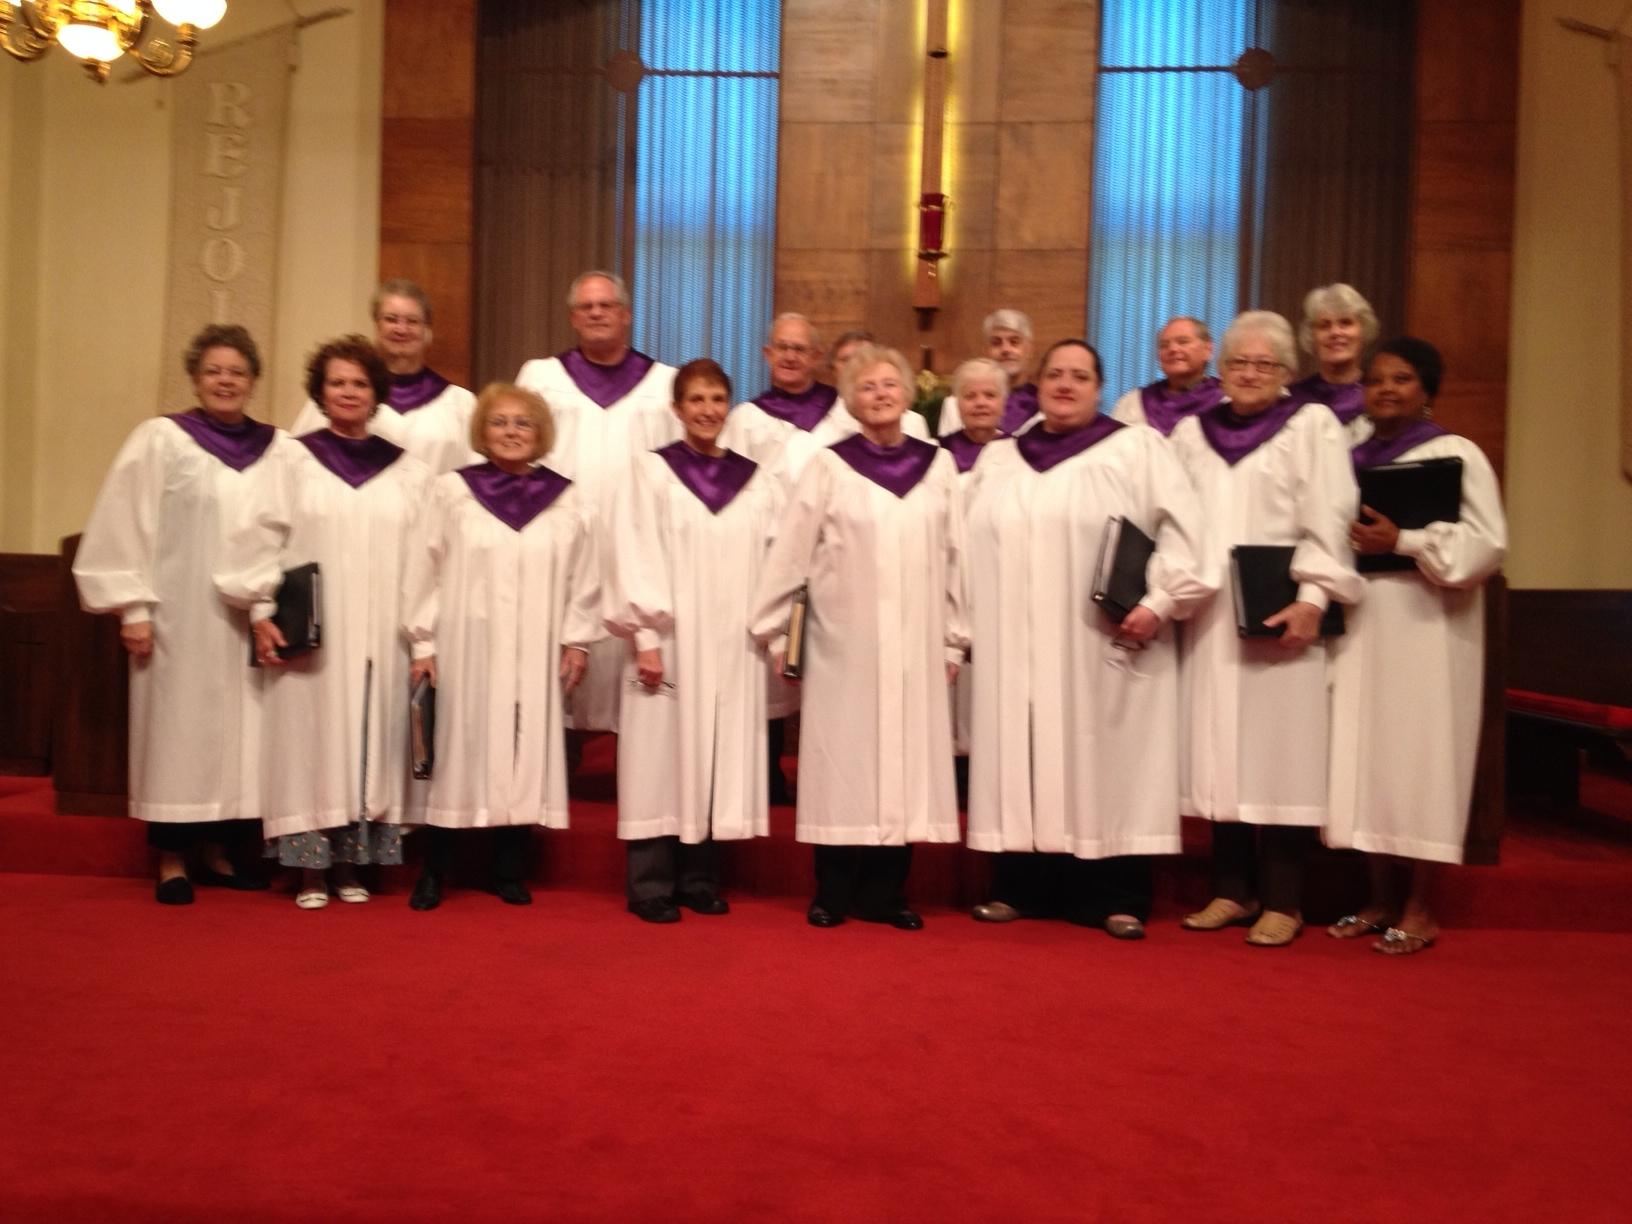 The St. paul Chancel Choir